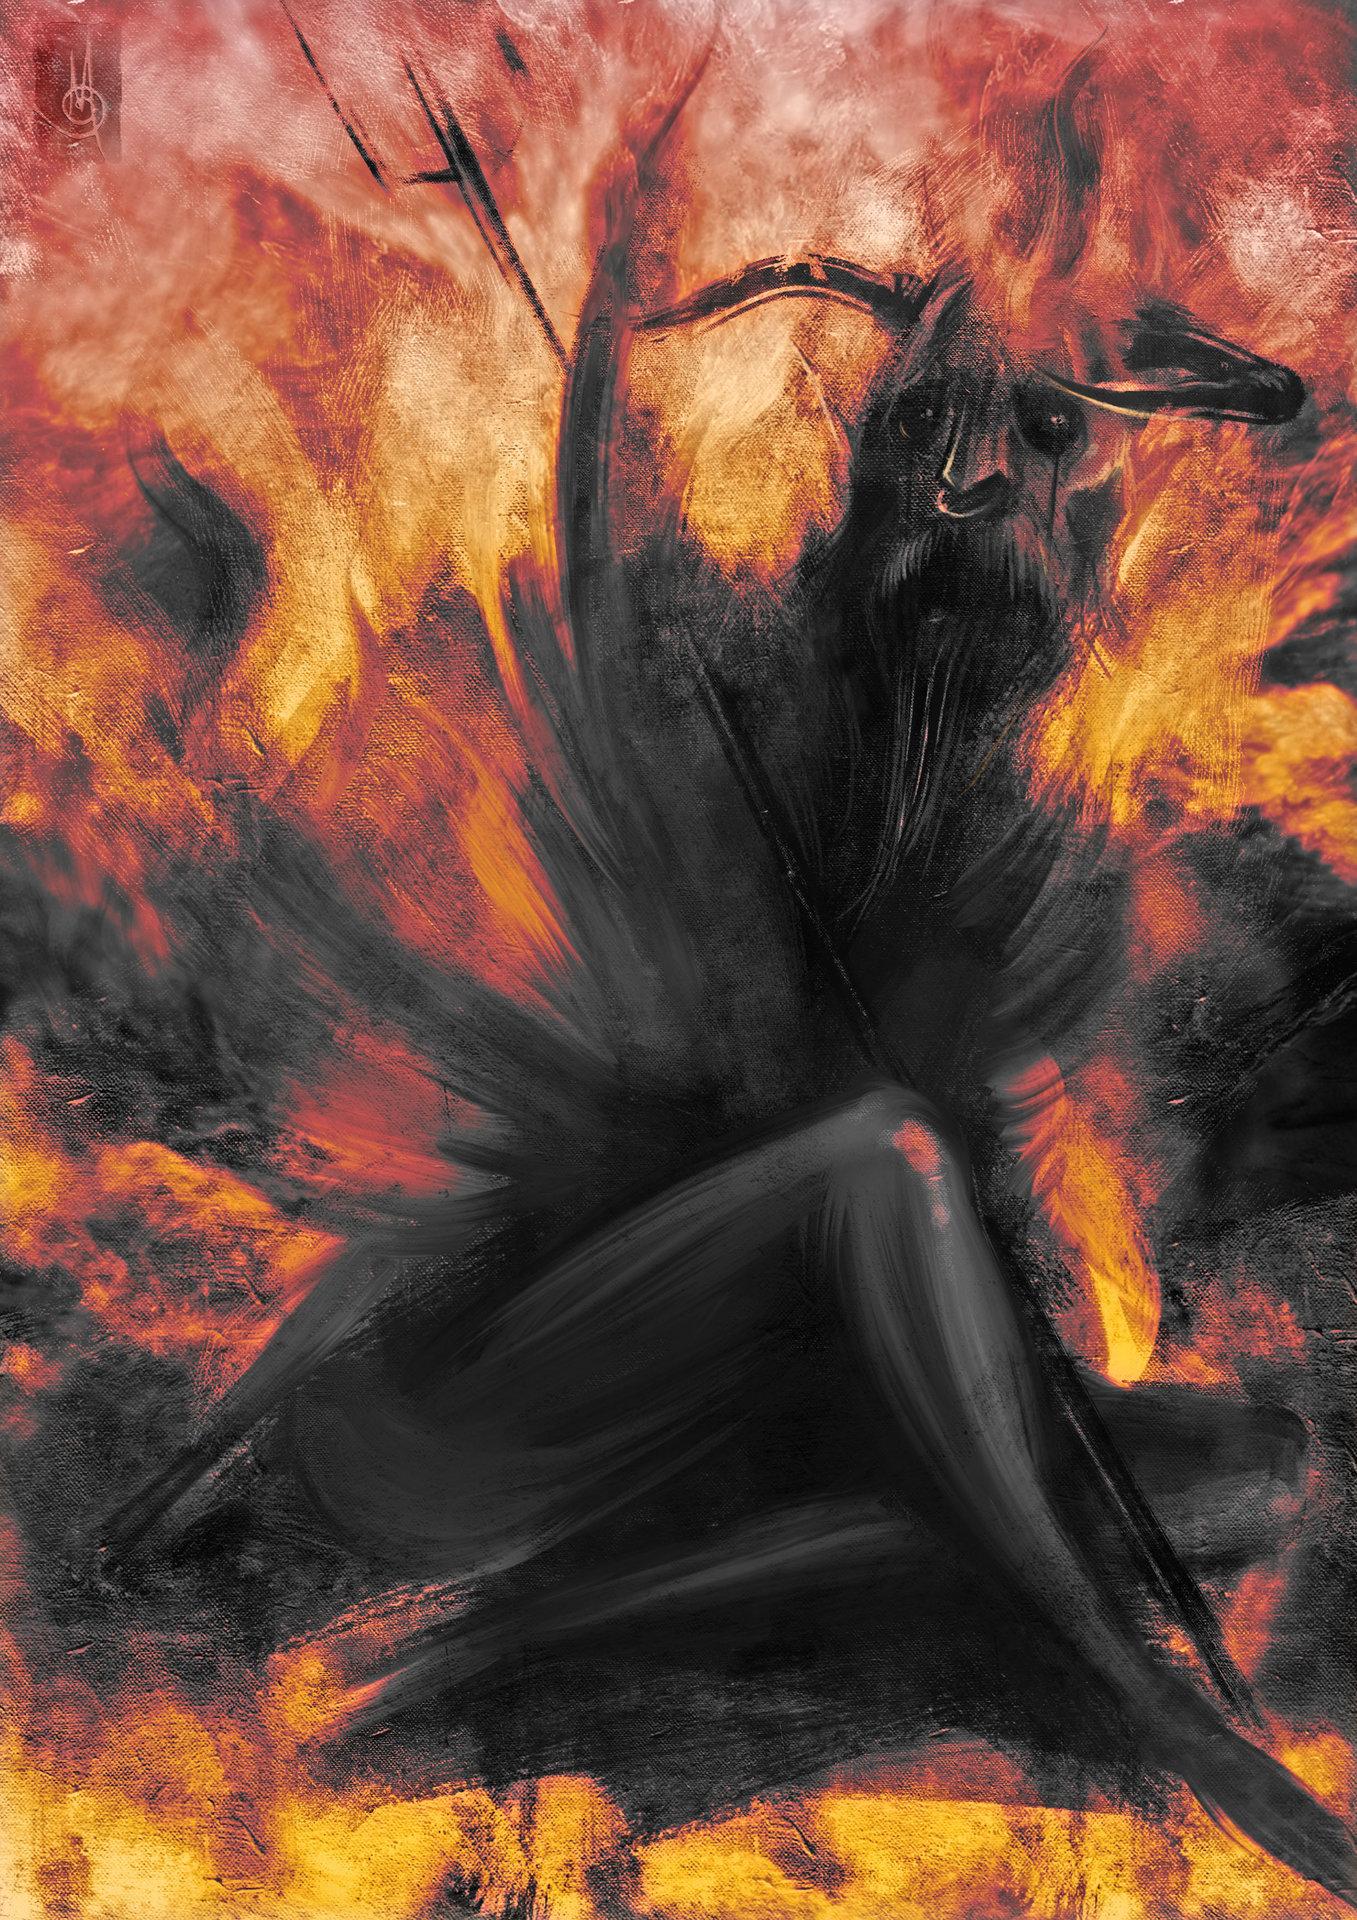 Murat gul the devil by muratgul